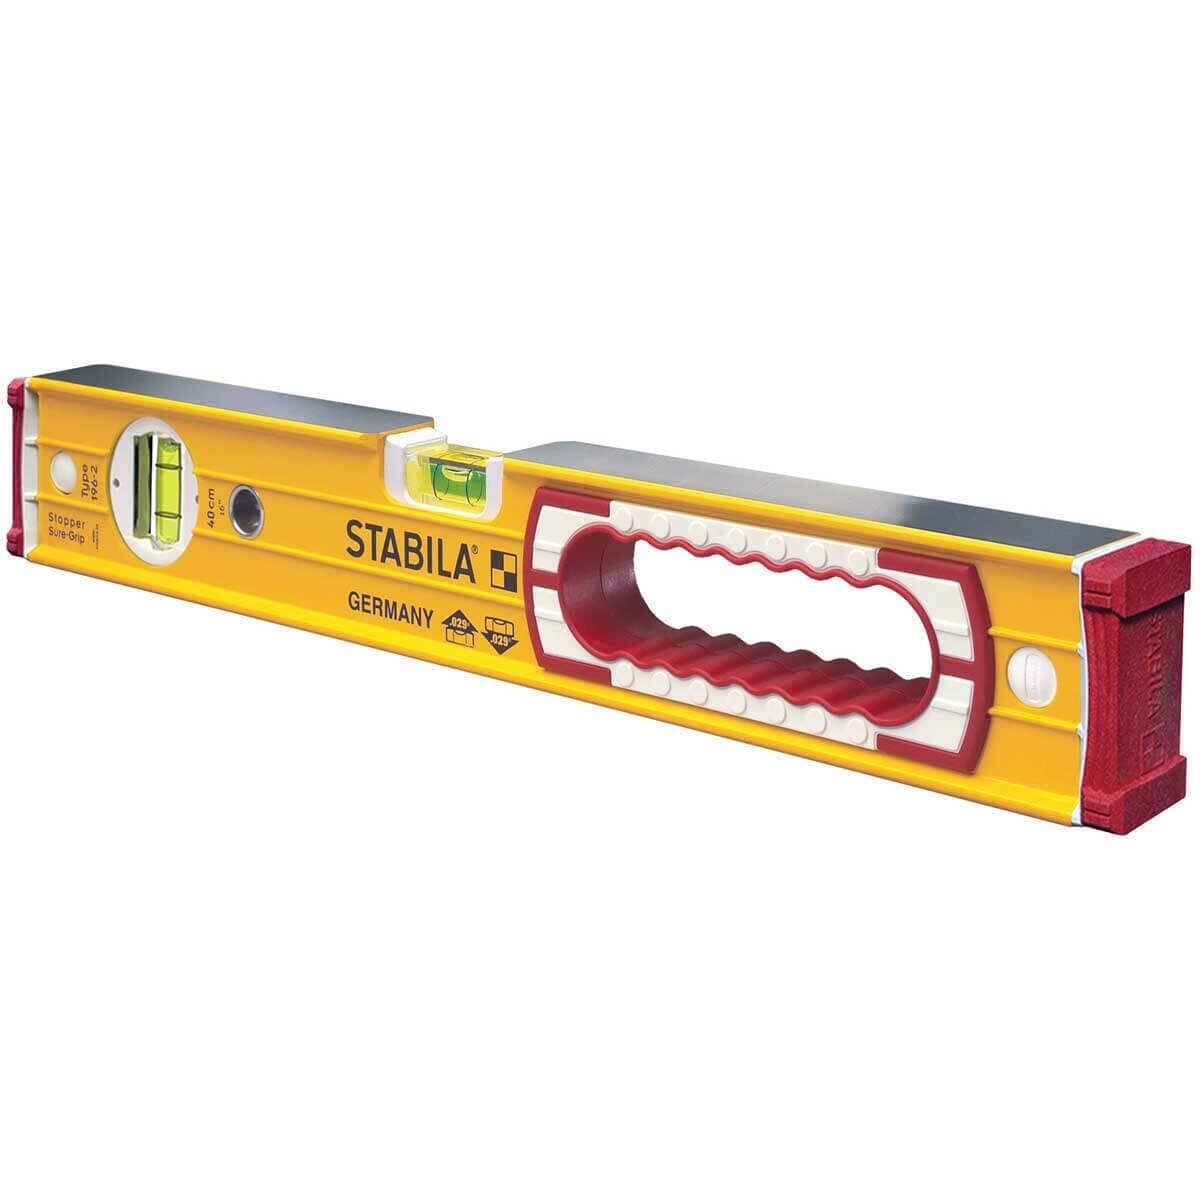 Stabila Type 196 16 inch Level